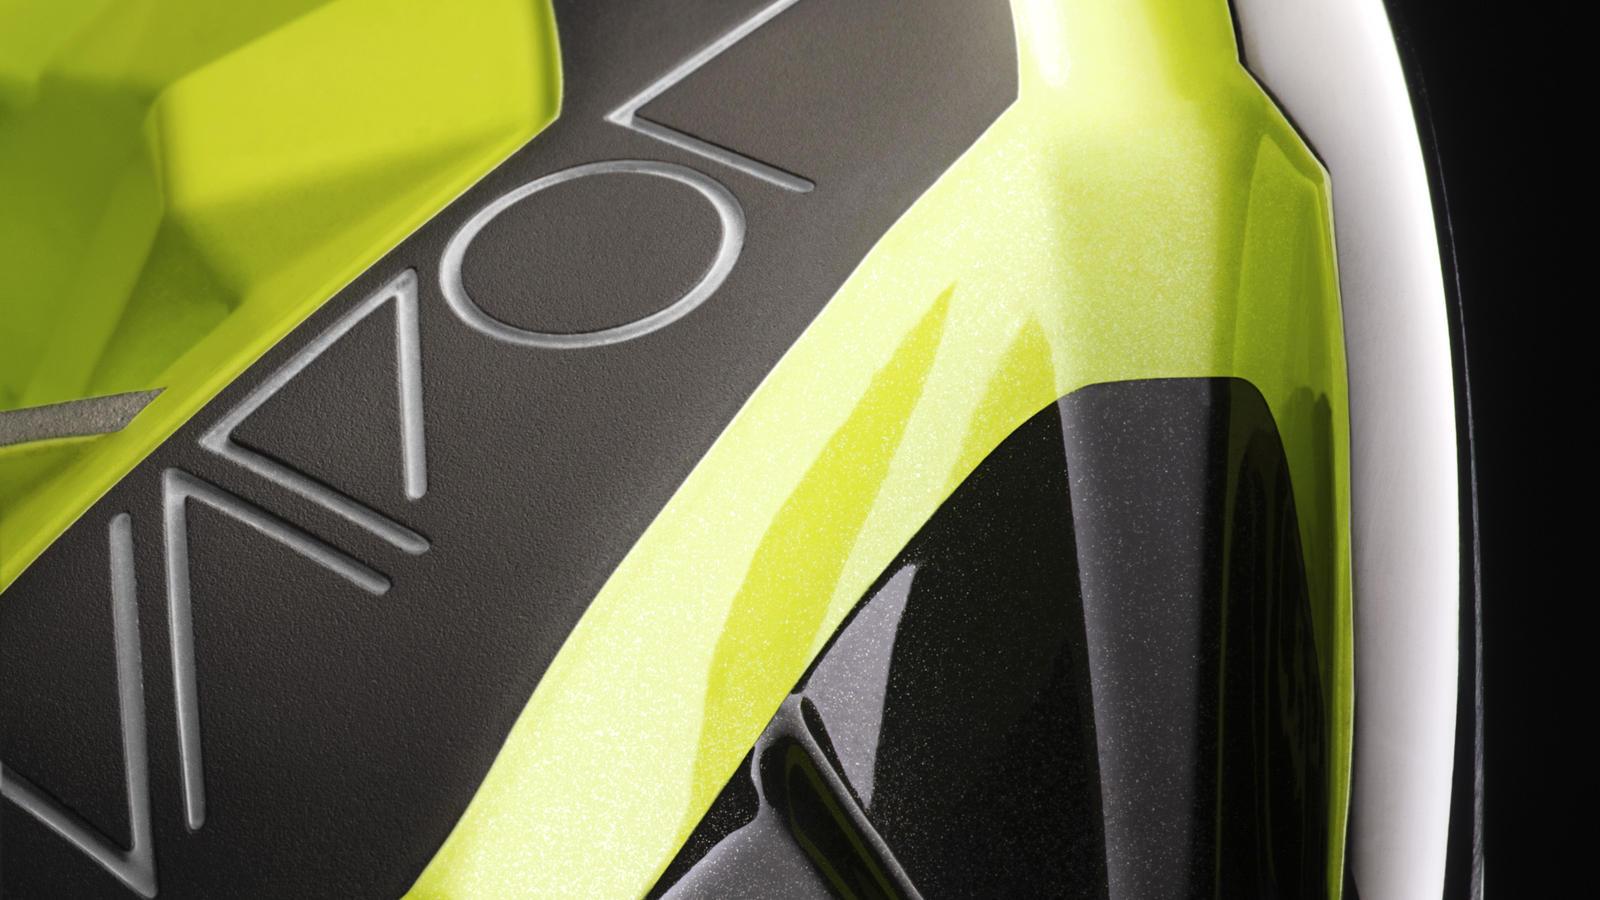 Nike Vapor Pro driver - Sole